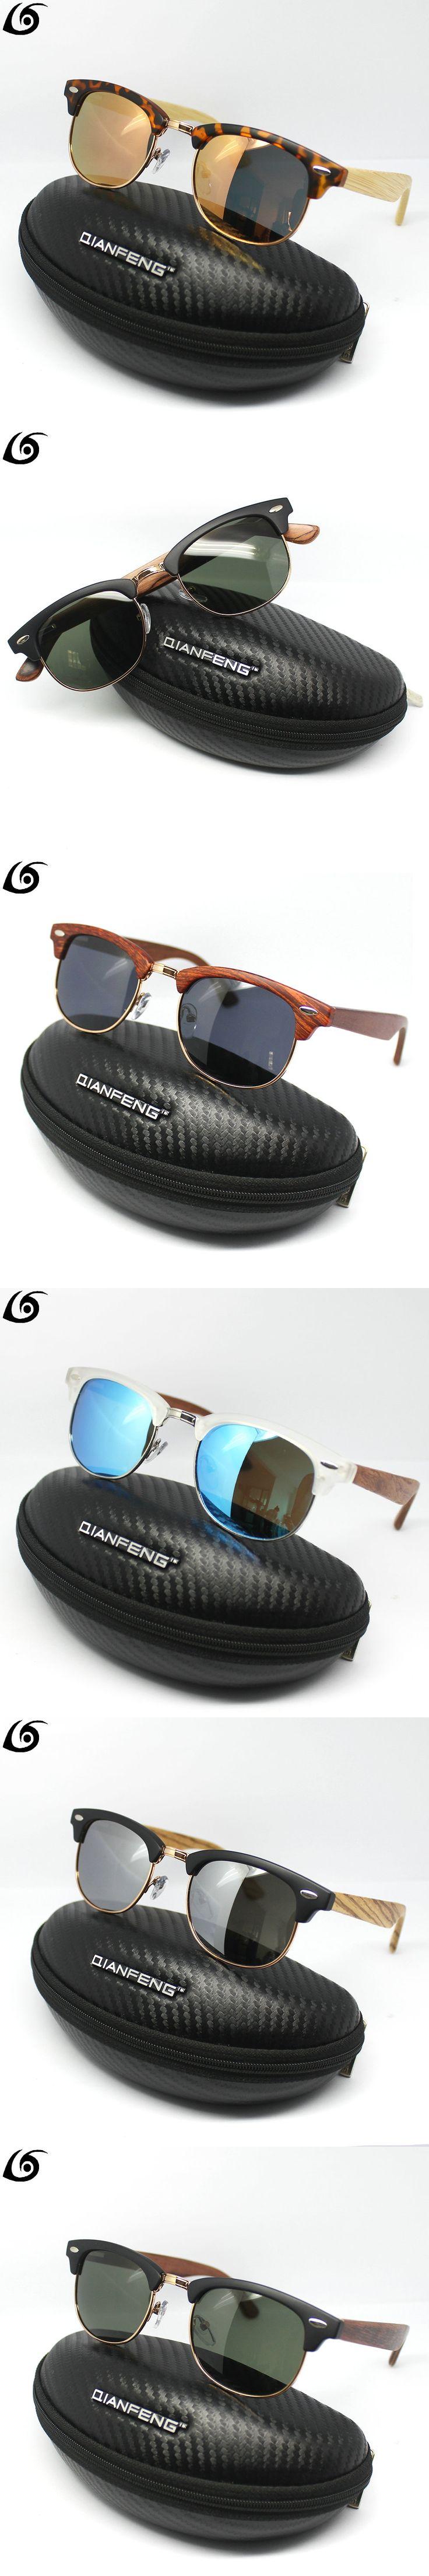 QianFeng Retro Wood Sunglasses Men Bamboo Sunglass Women Brand Design Sport Goggles Gold Mirror Sun Glasses Shades lunette oculo